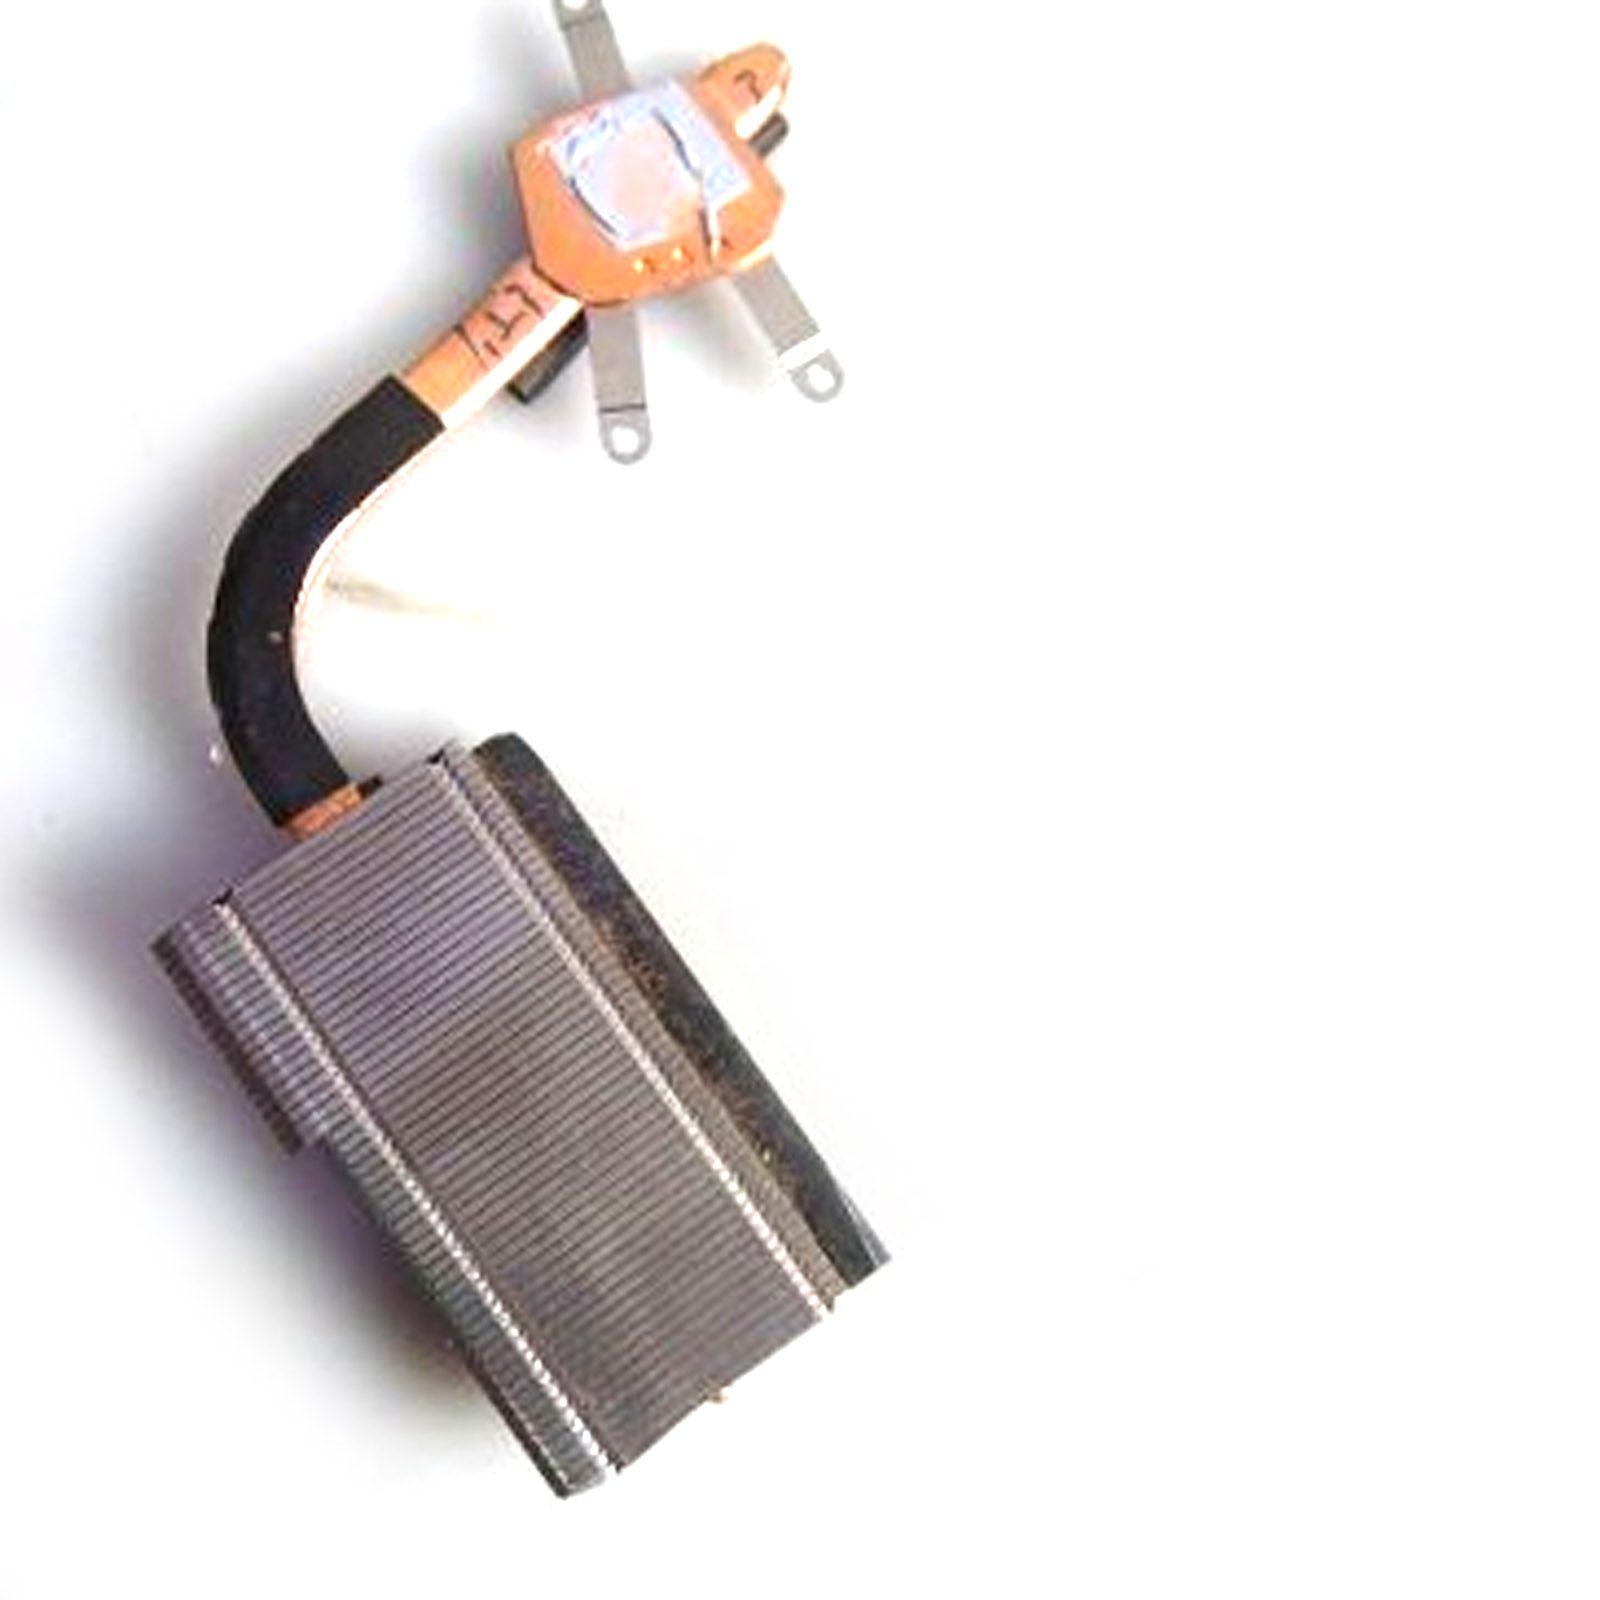 Dissipador P/ Notebook Positivo Sim+ 390  380 PN:11068056 - Retirado